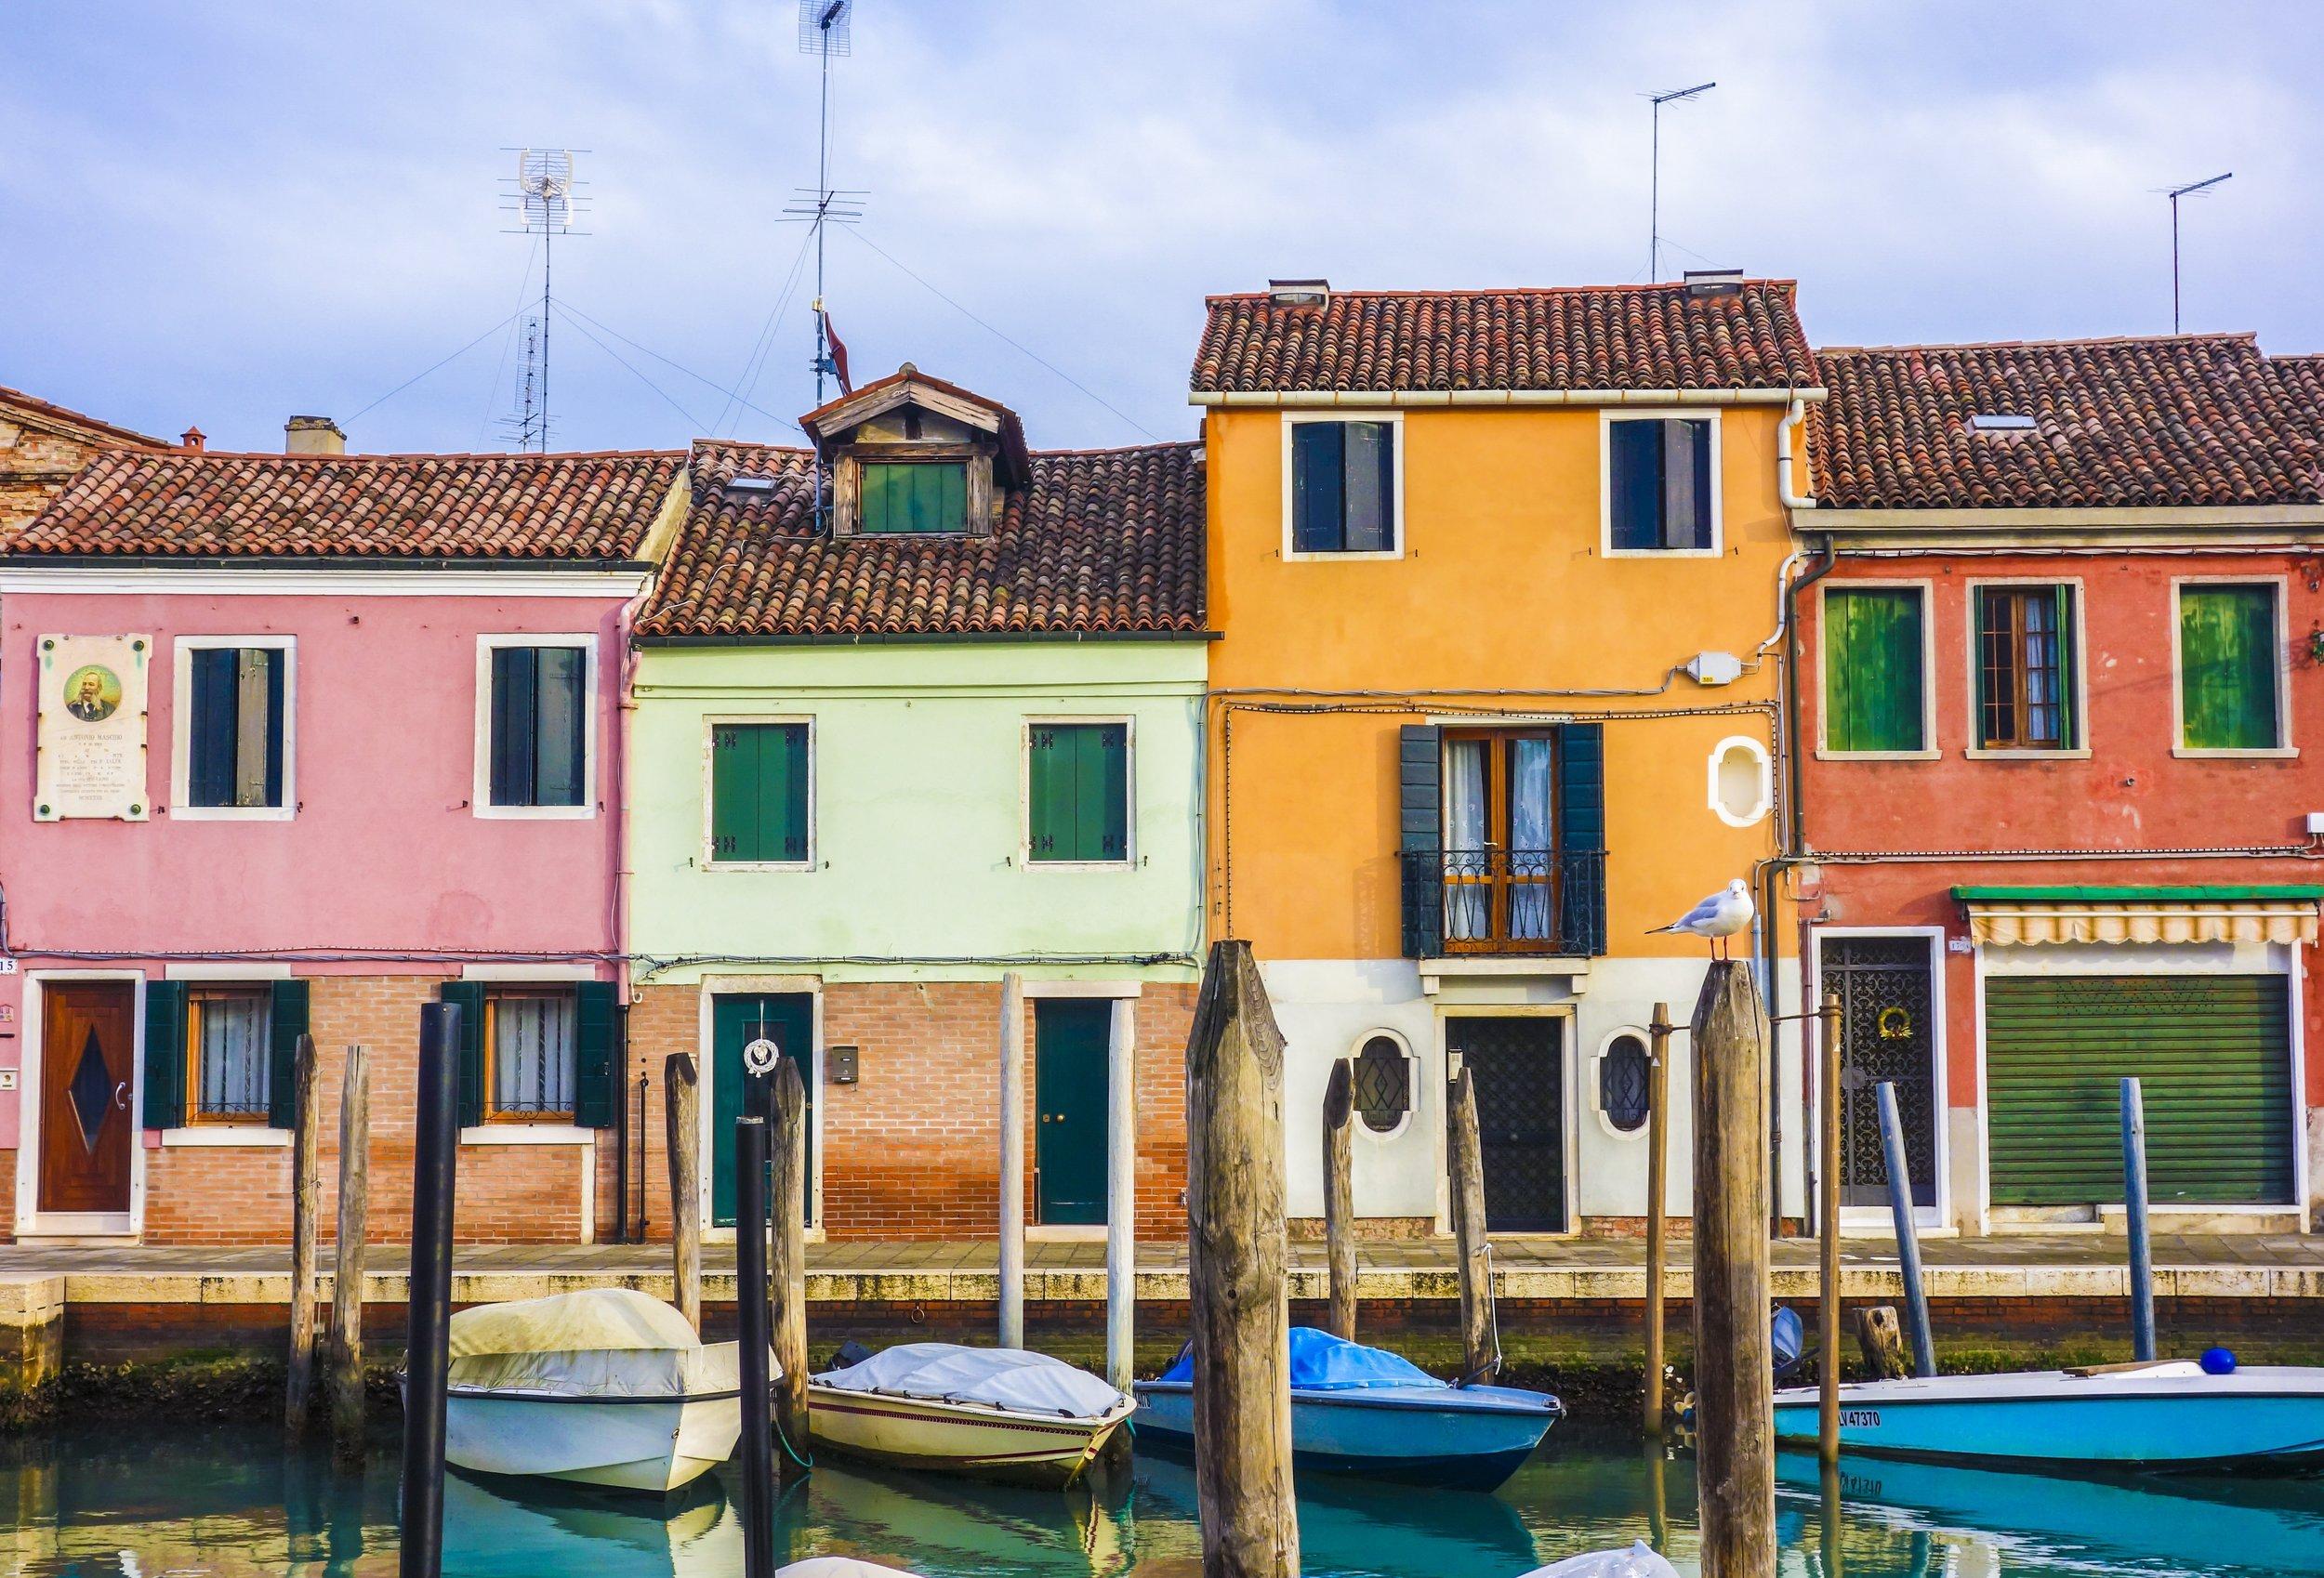 colourful-houses-1622066.jpg